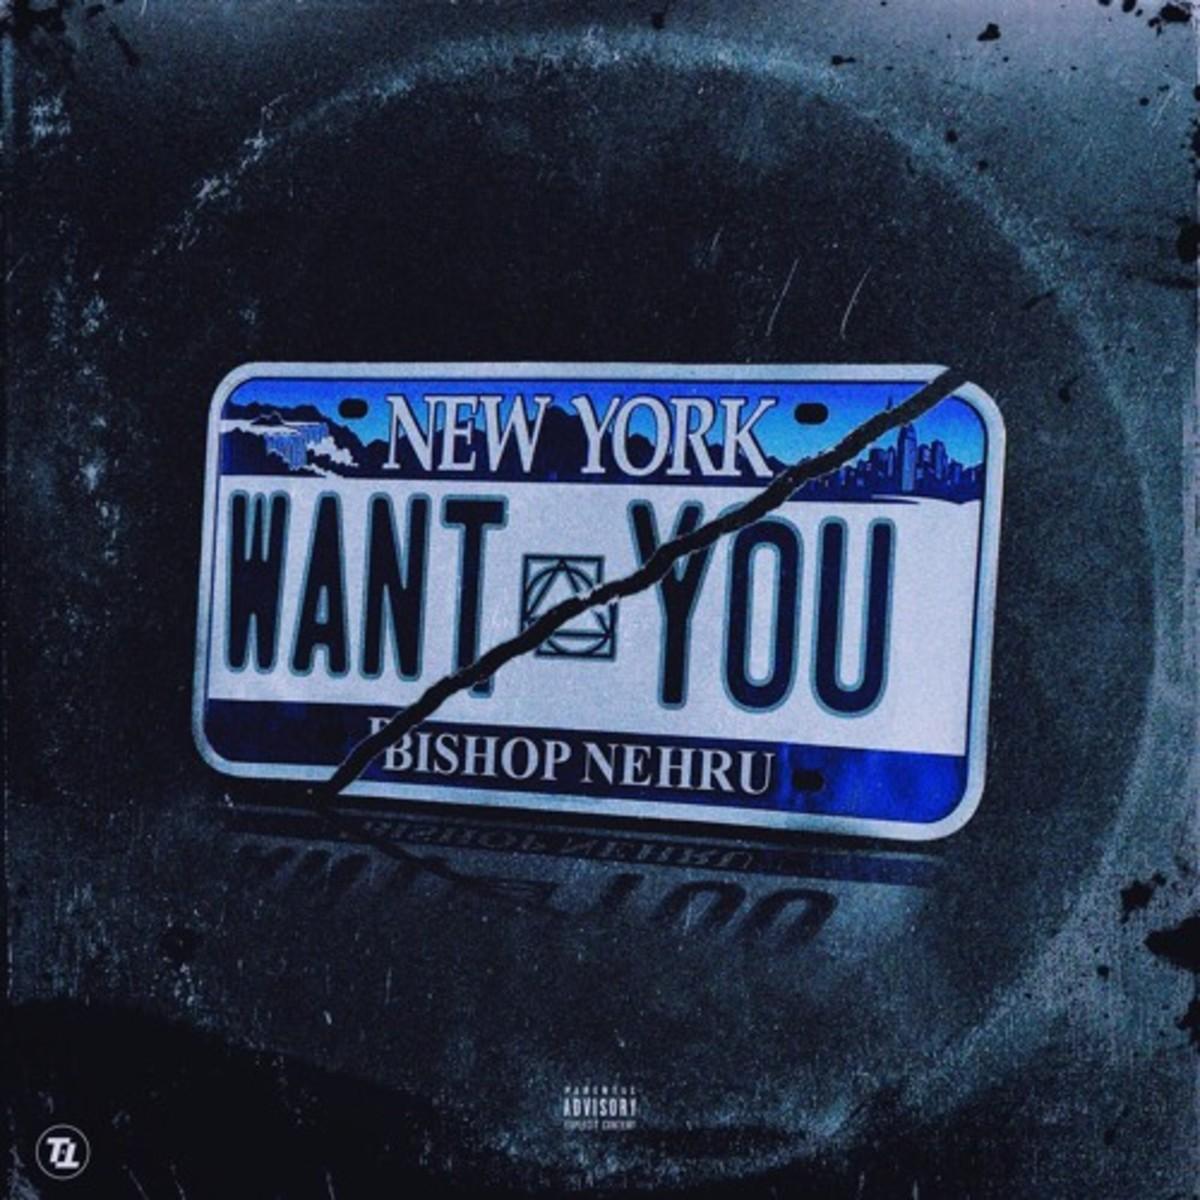 bishop-nehru-want-you.jpg